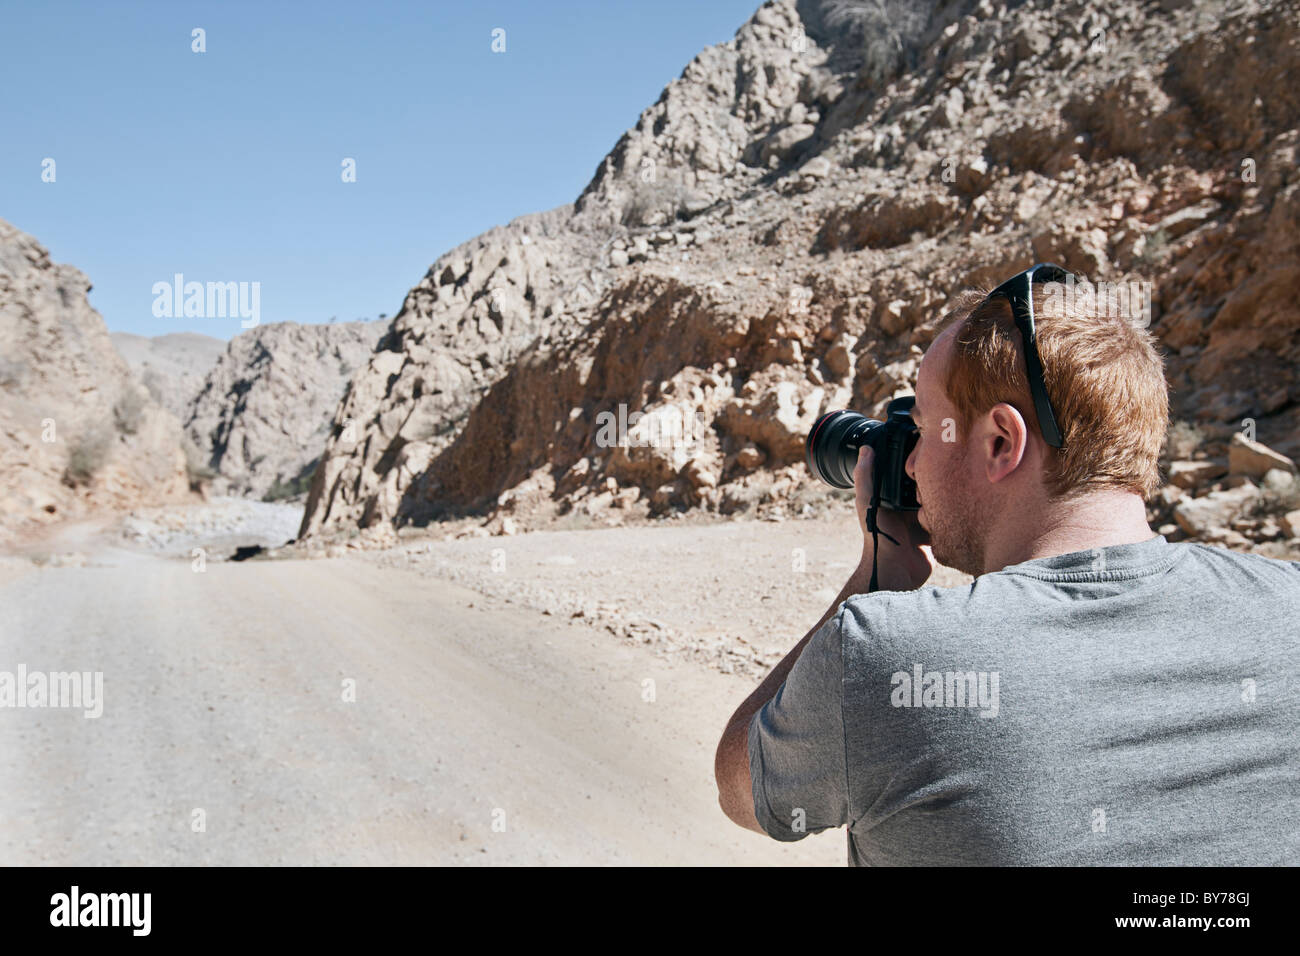 Touristen fotografieren im Wadi Bih, Oman Stockbild